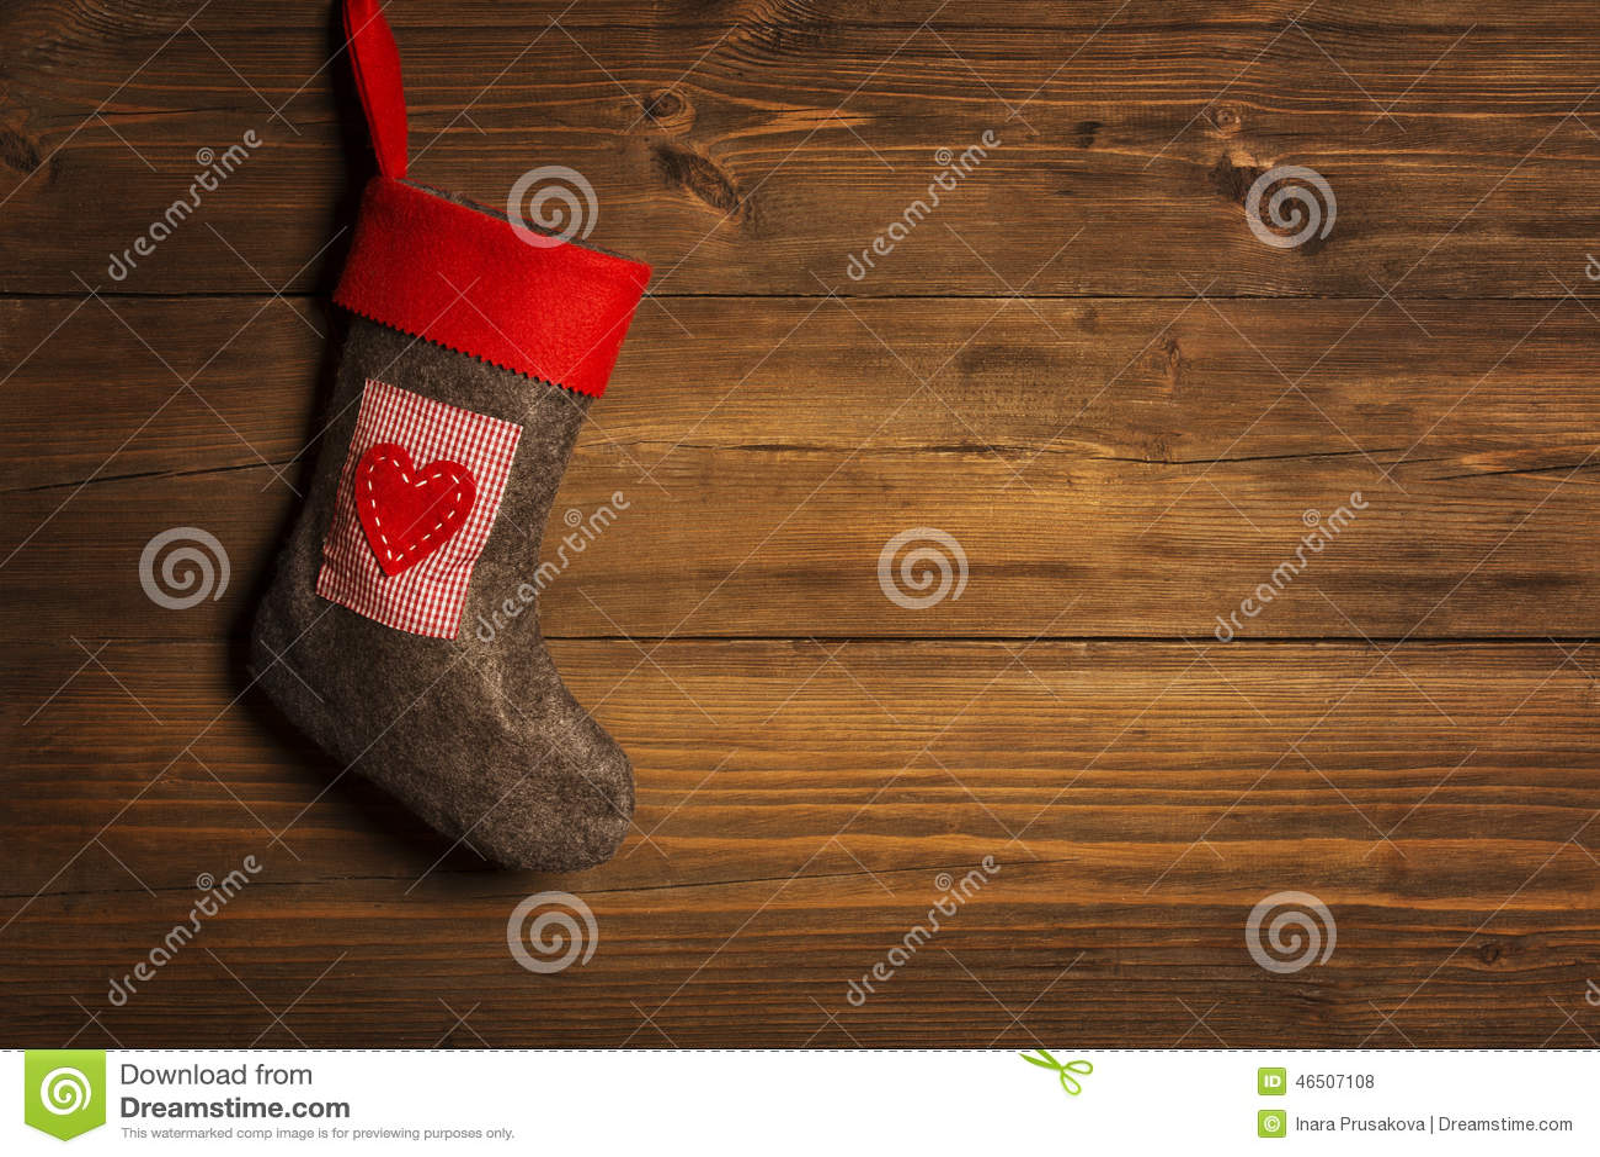 Christmas Stocking, Sock Hanging Over Grunge Wooden Background,